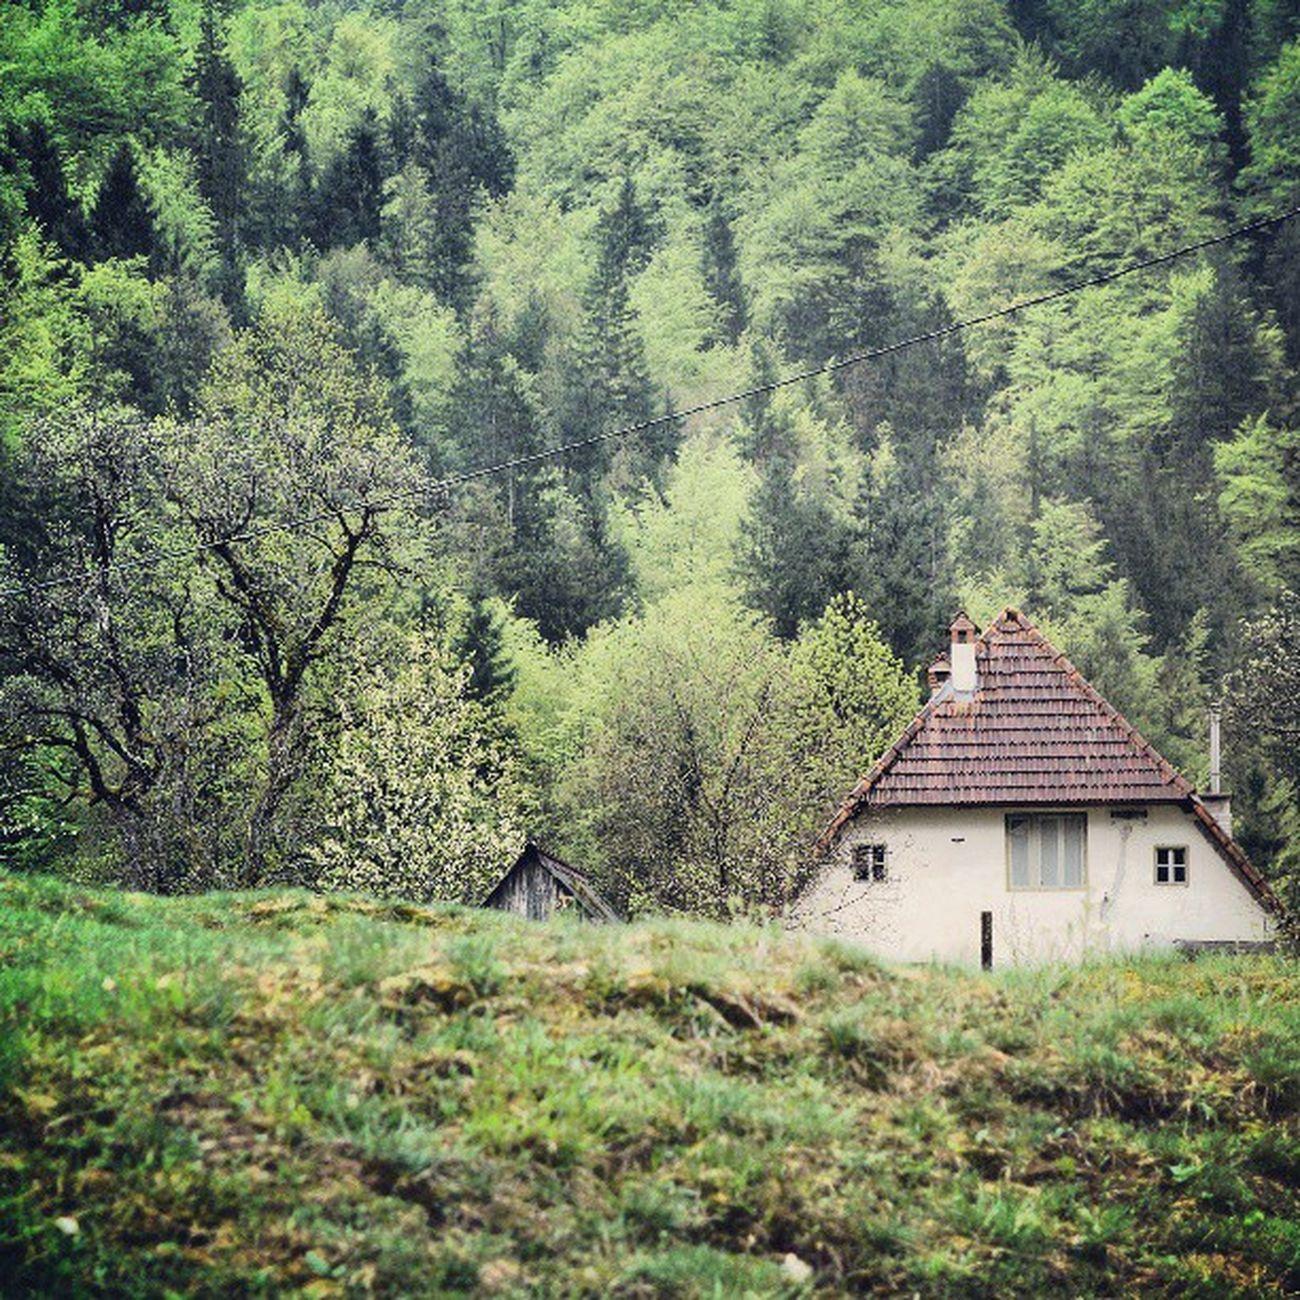 Kmečka hiša. Slovenia Trenta Igslovenia Slovenija